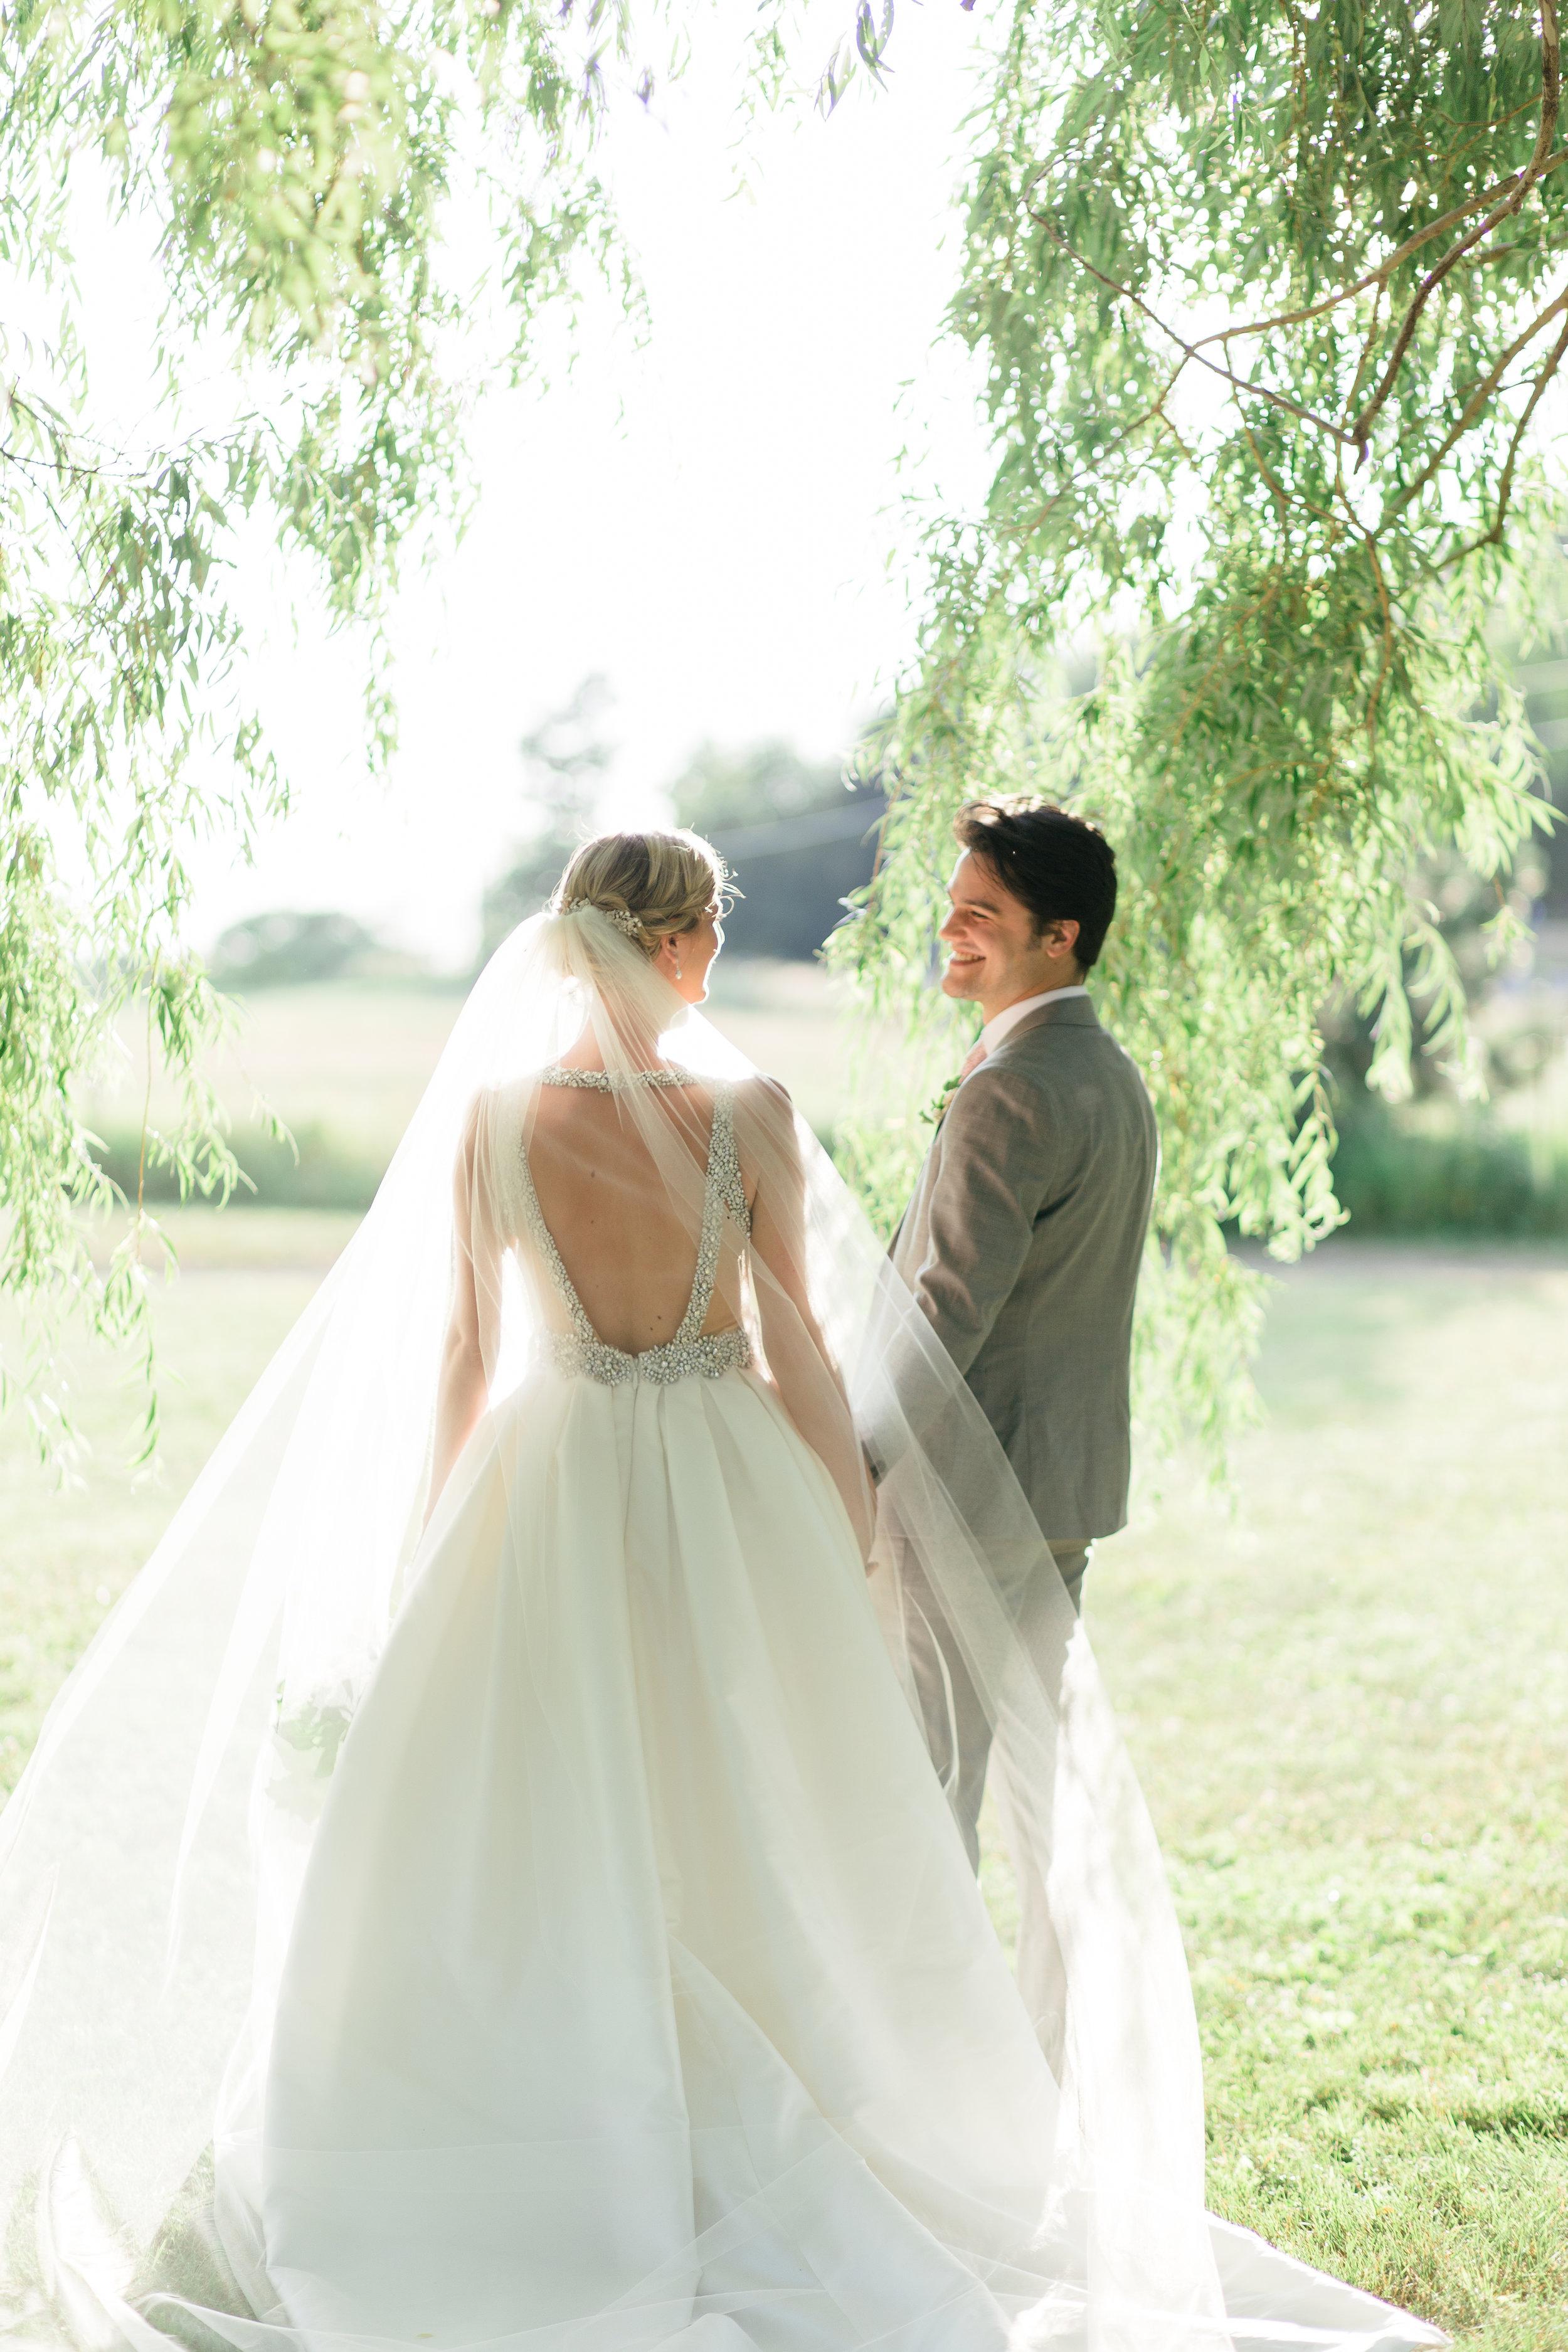 Caroline & Jon Final Images-32.jpg